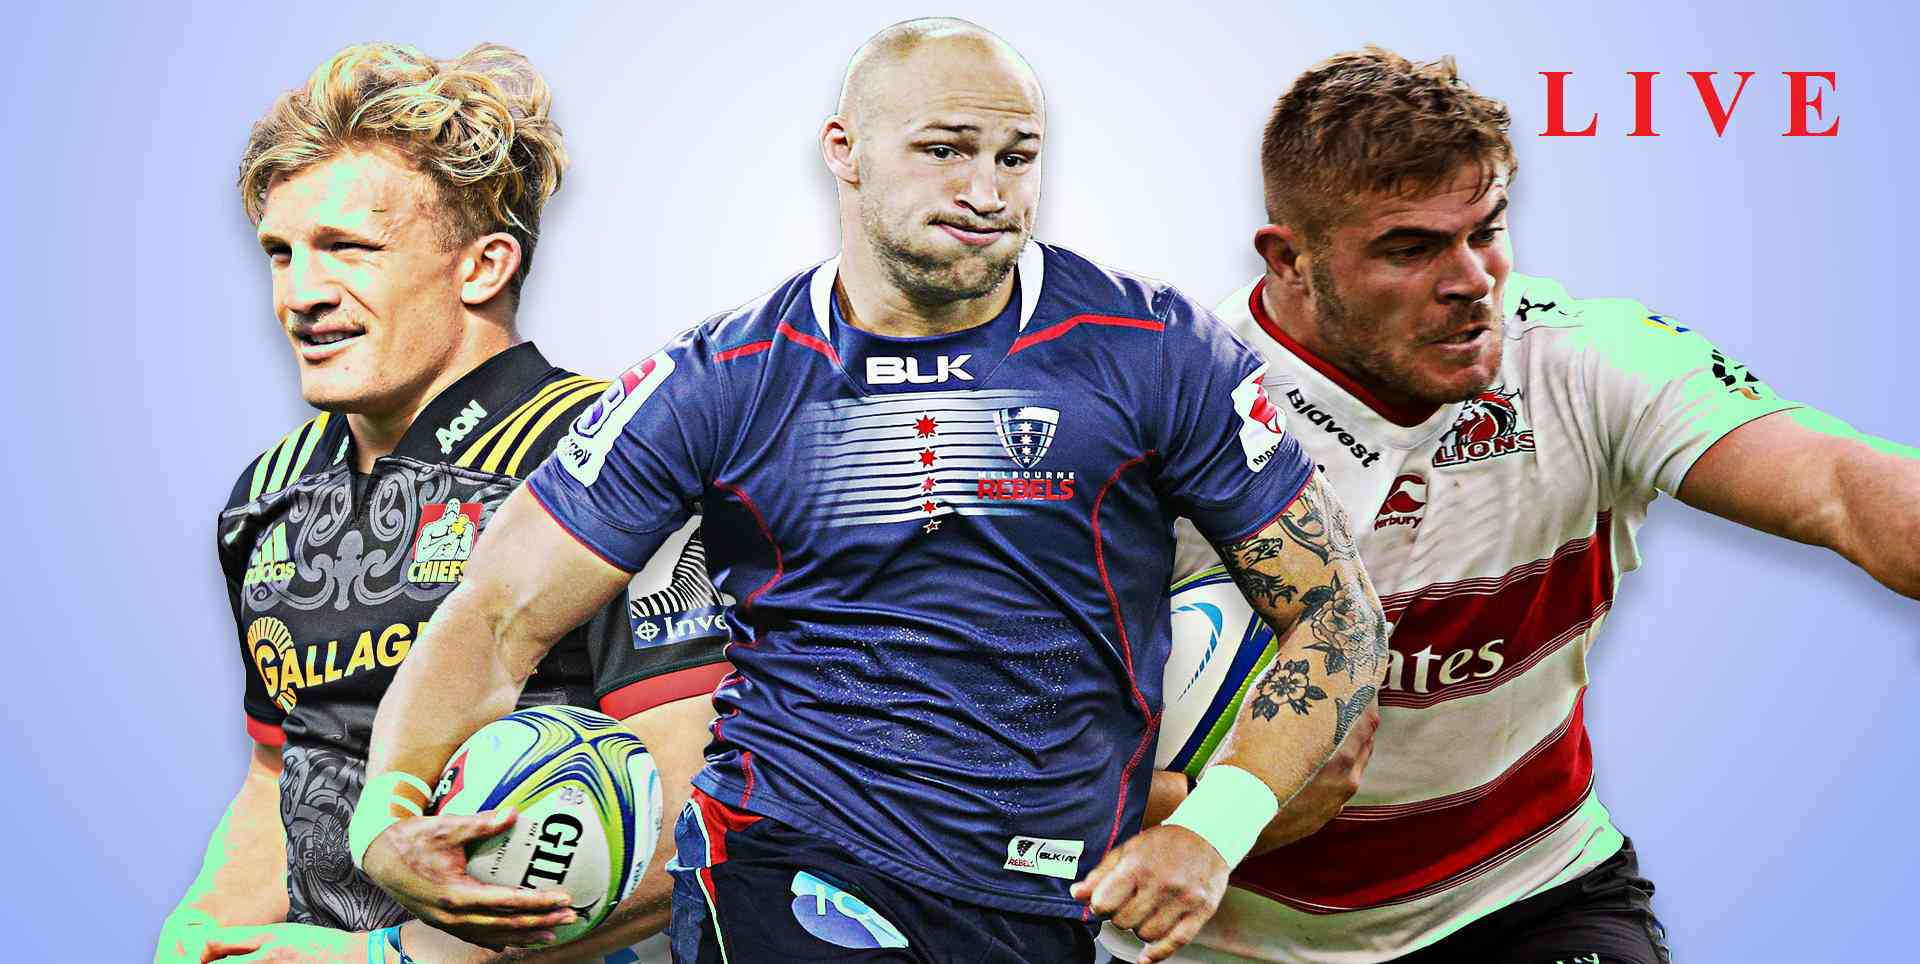 harlequins-vs-ulster-rugby-live